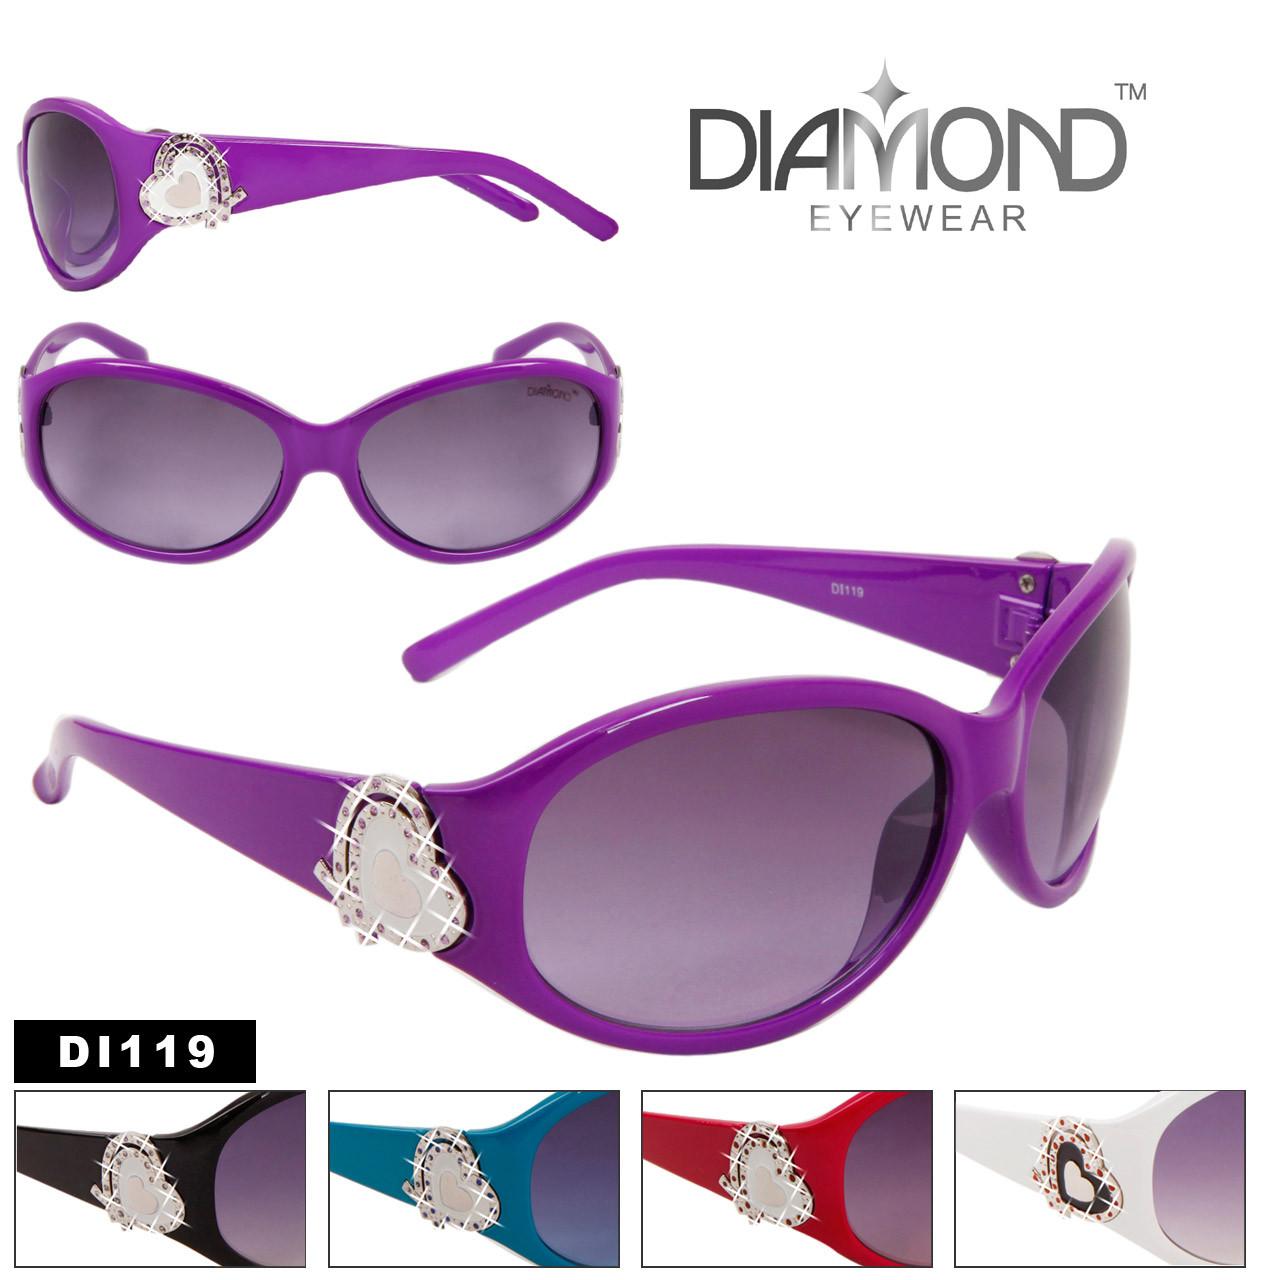 Heart Accent Diamond Eyewear with Rhinestones DI119